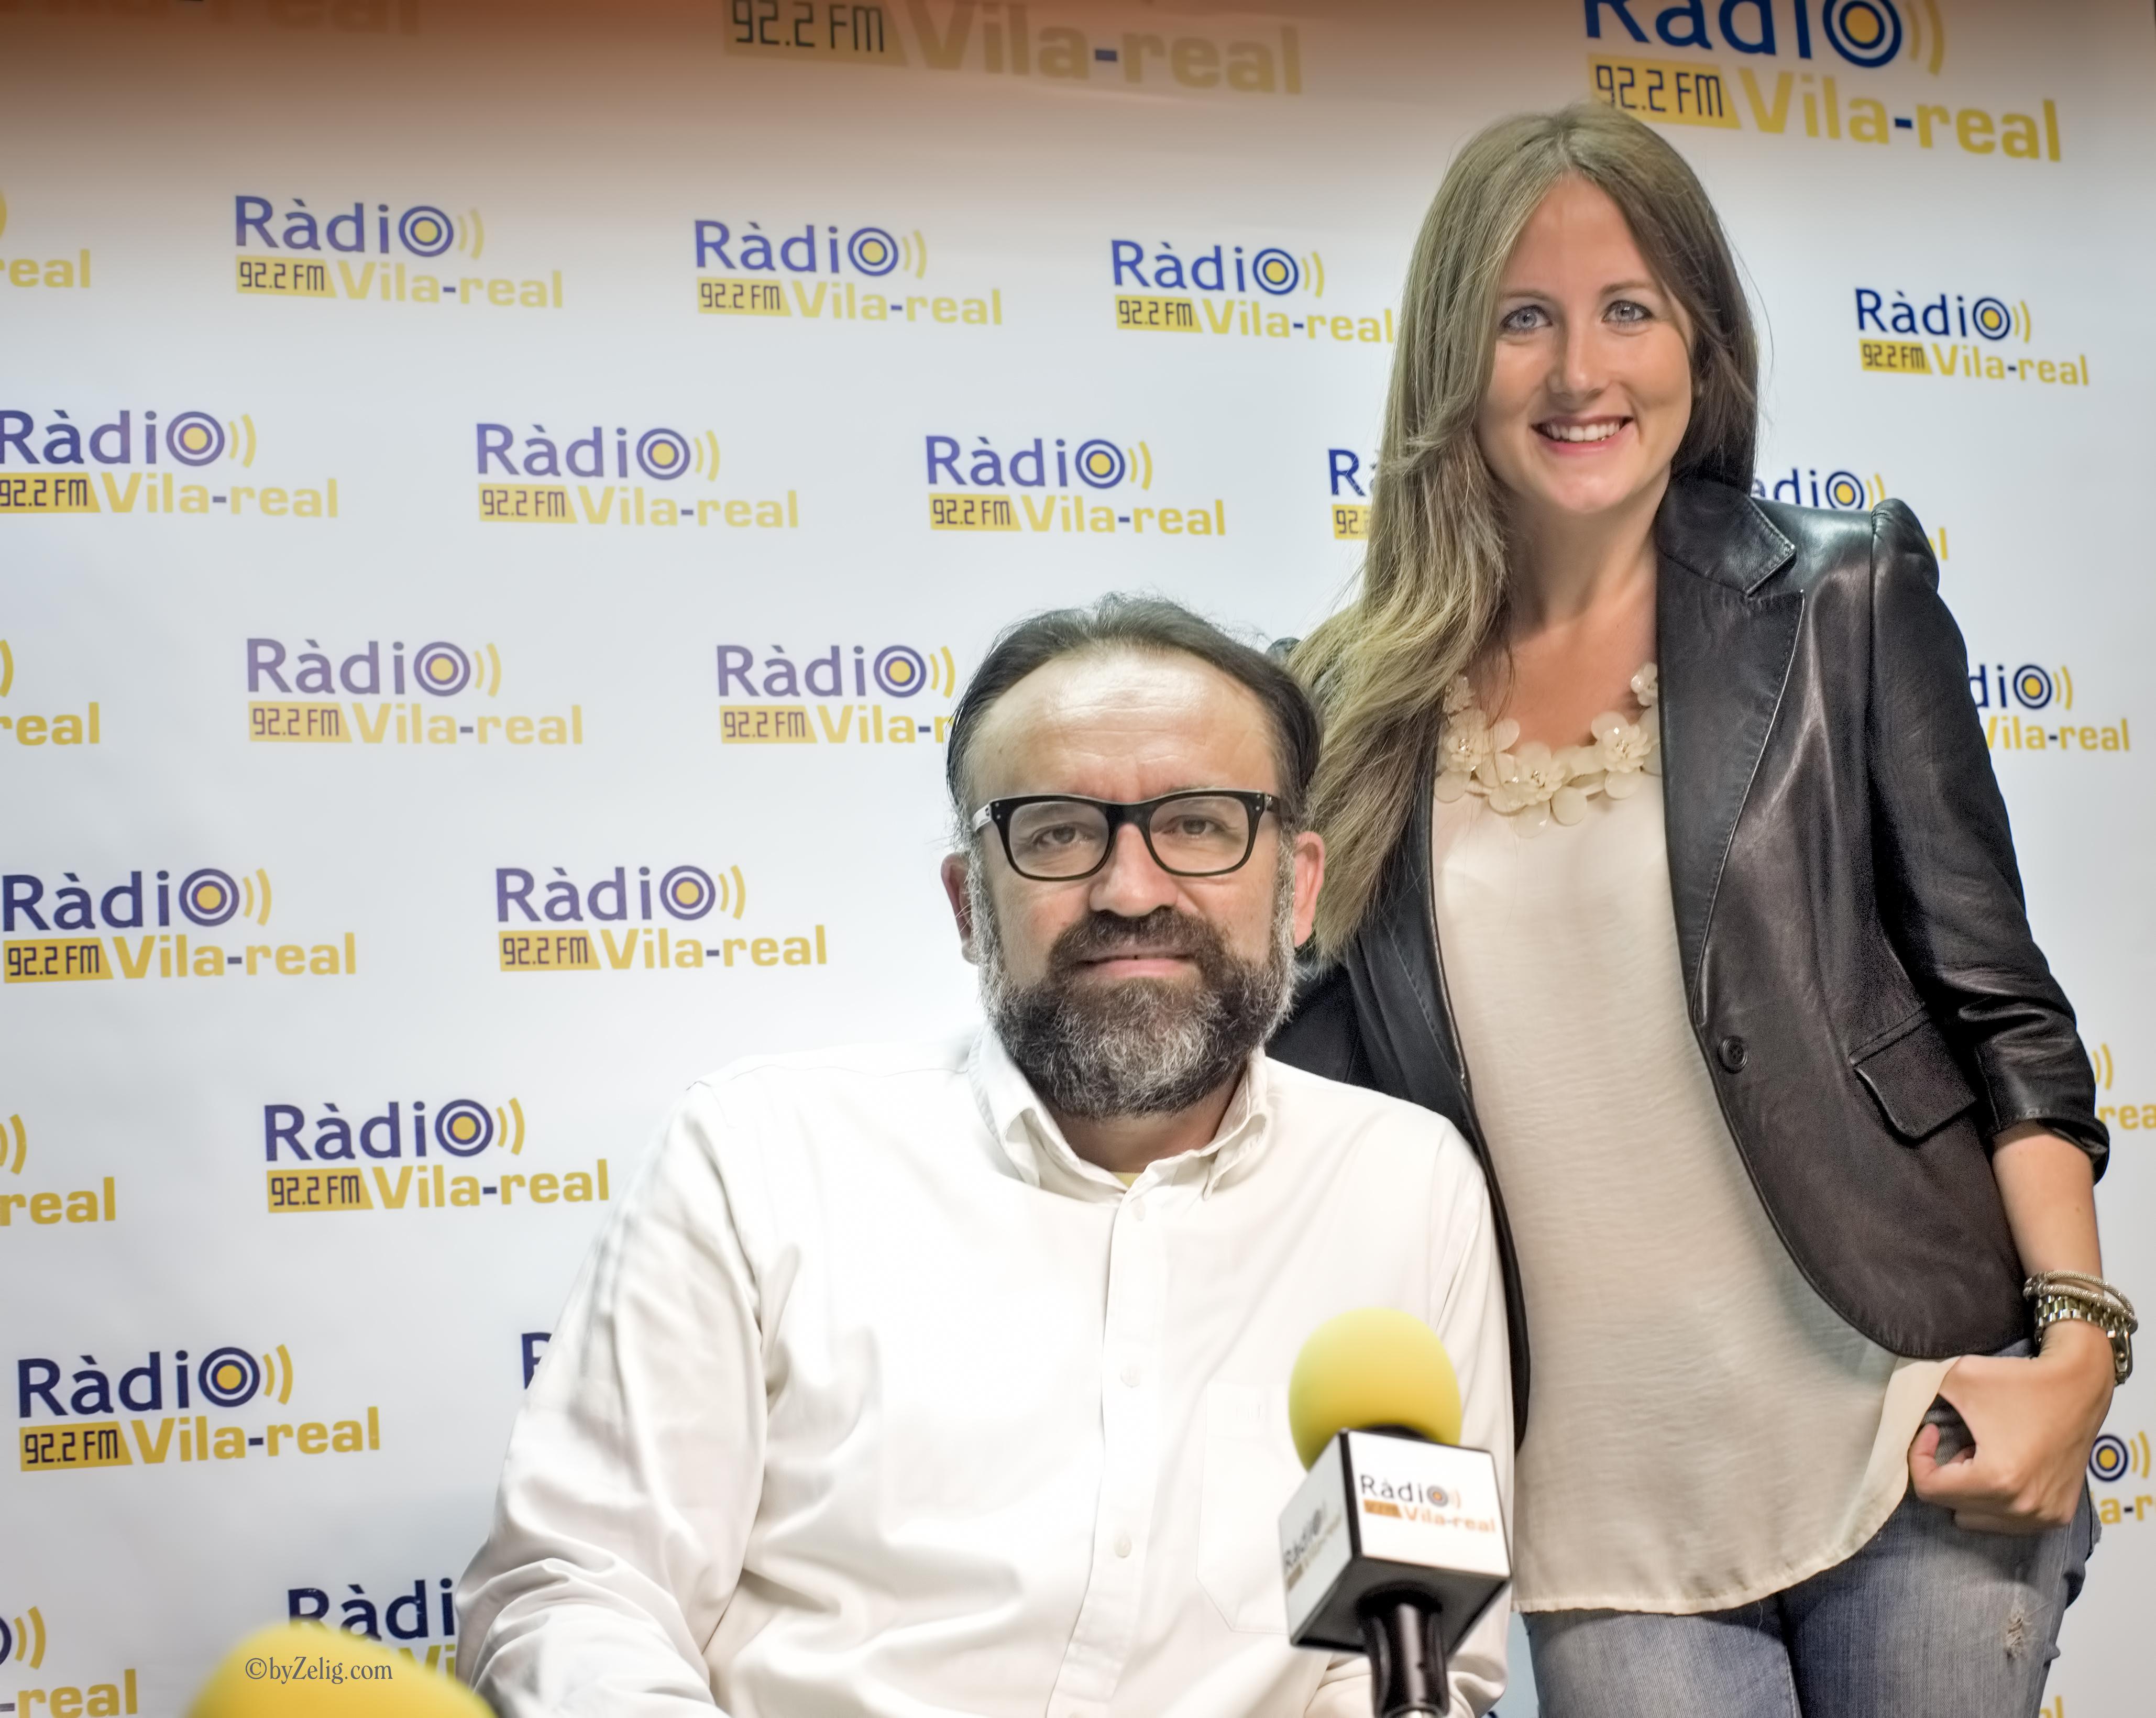 Esports Radio Vila-real. Programa del 10 de octubre 2017